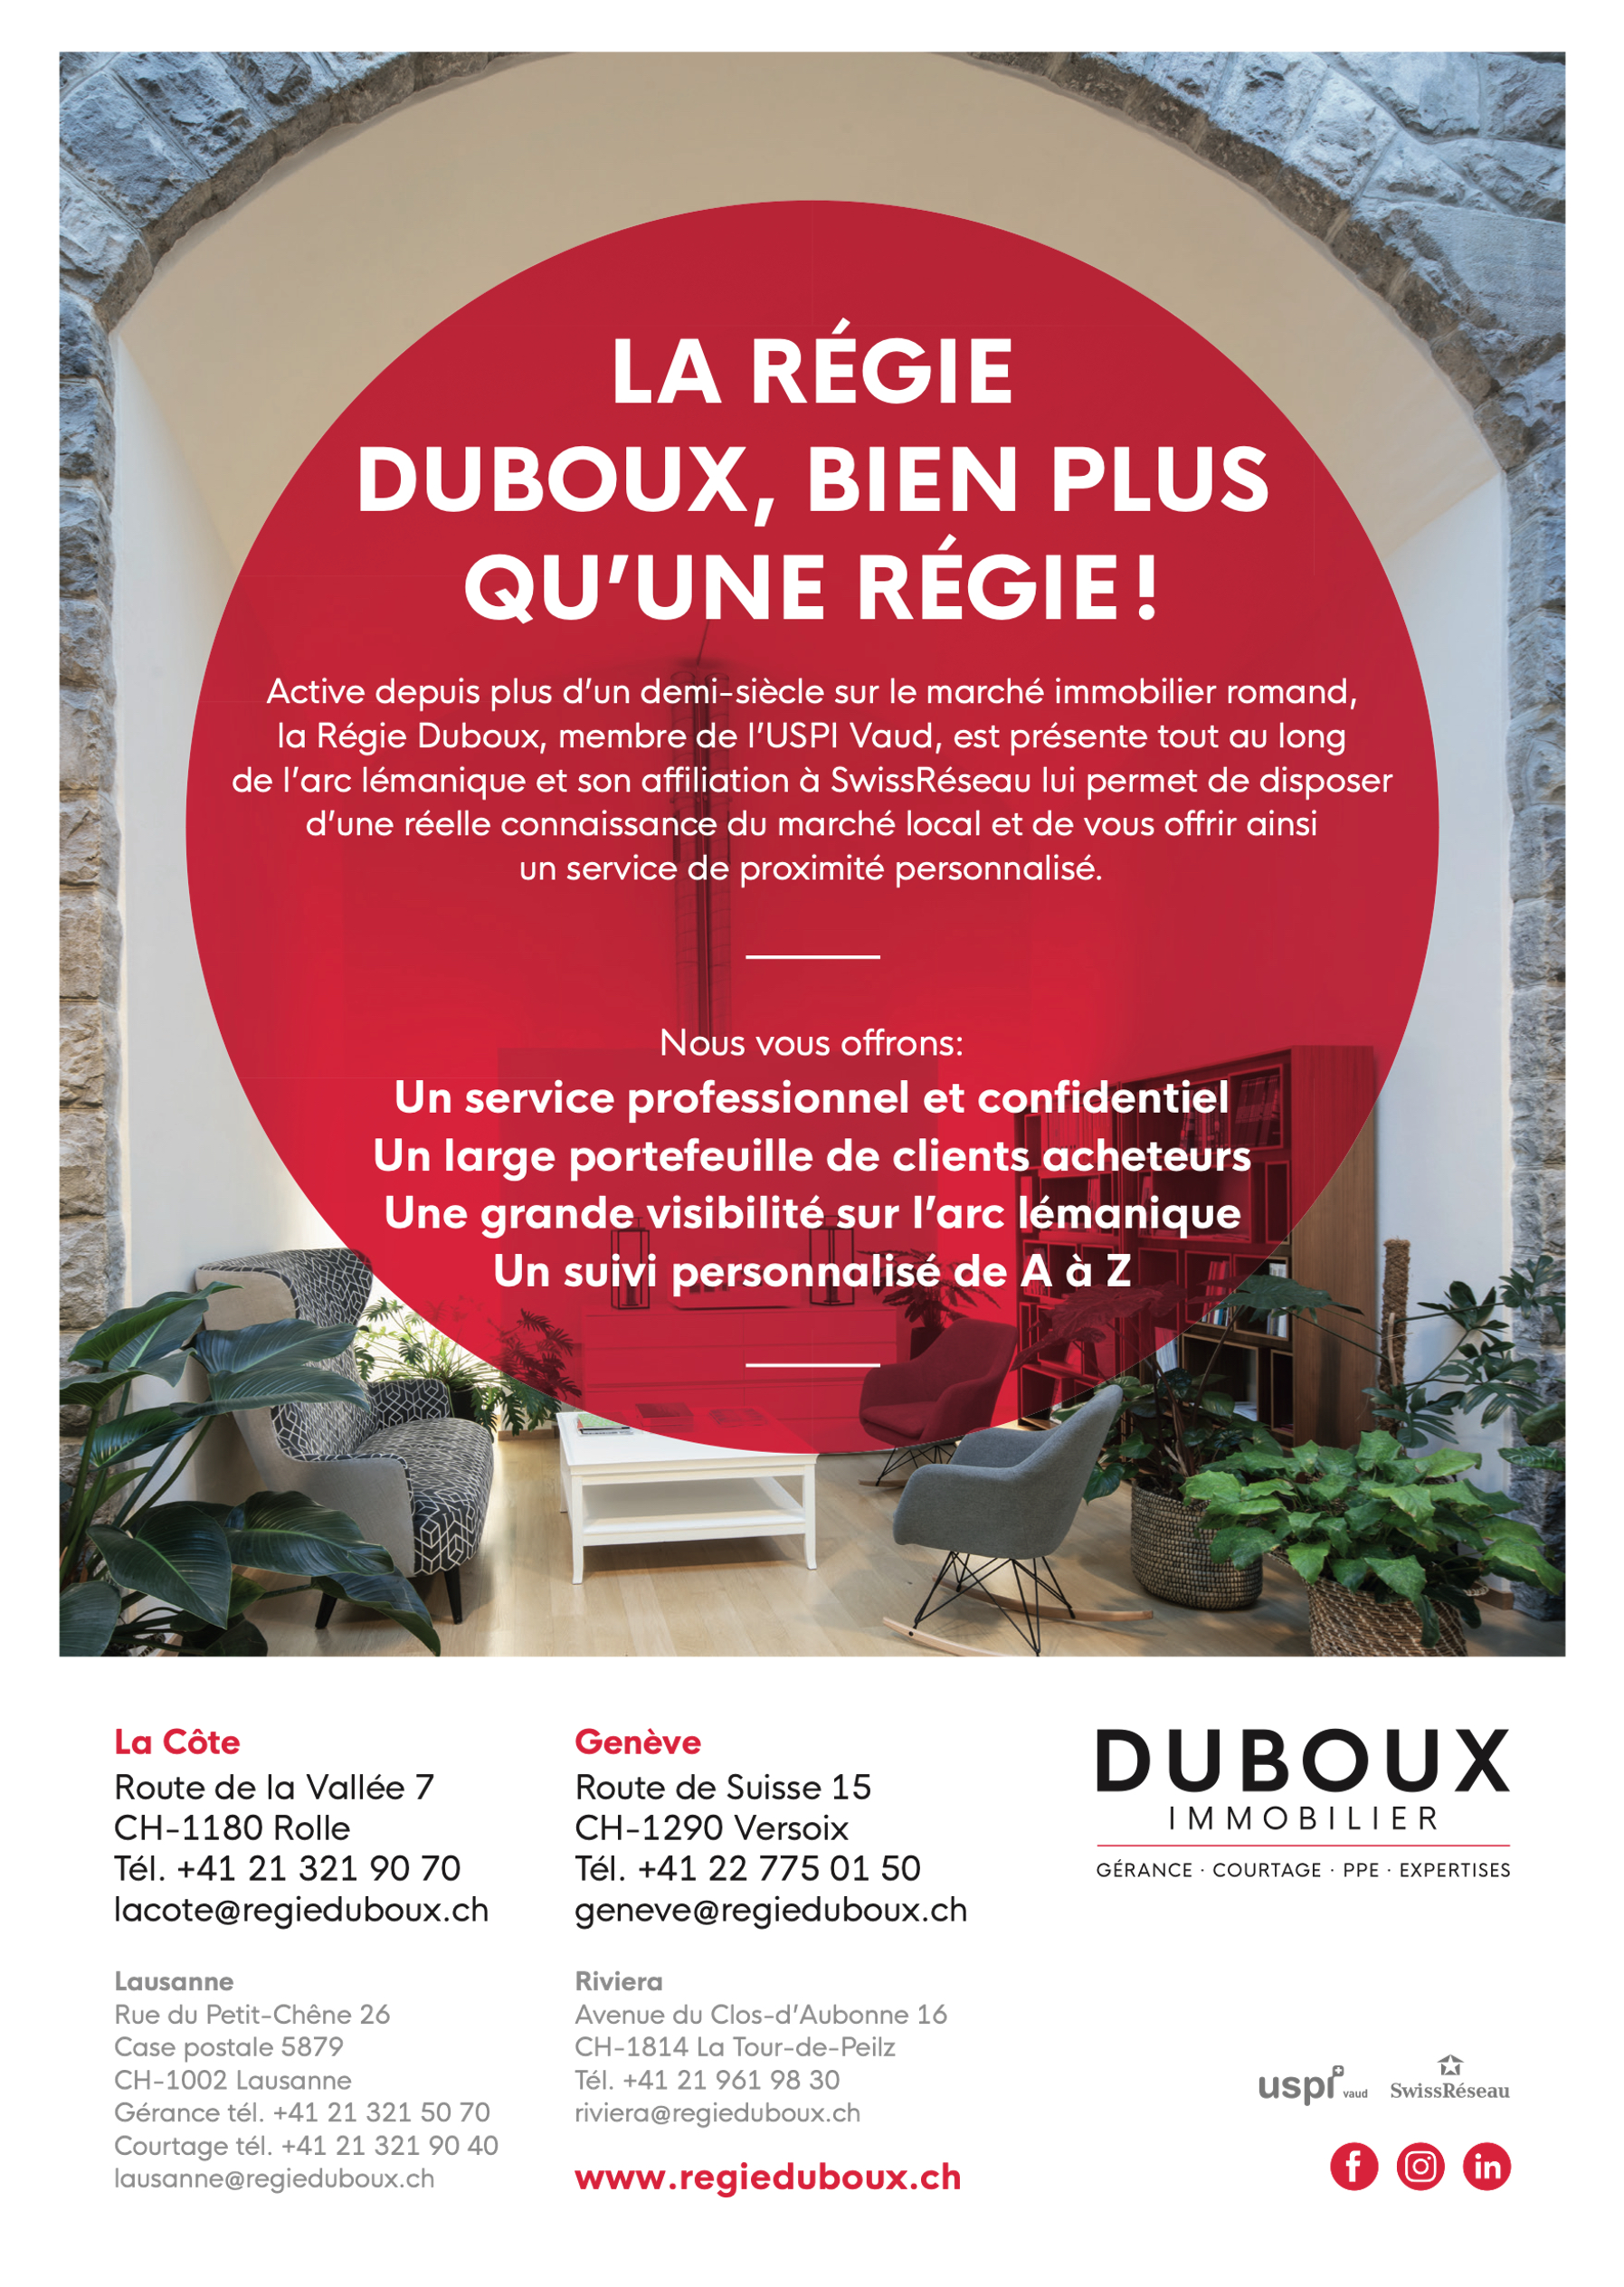 Duboux immobilier